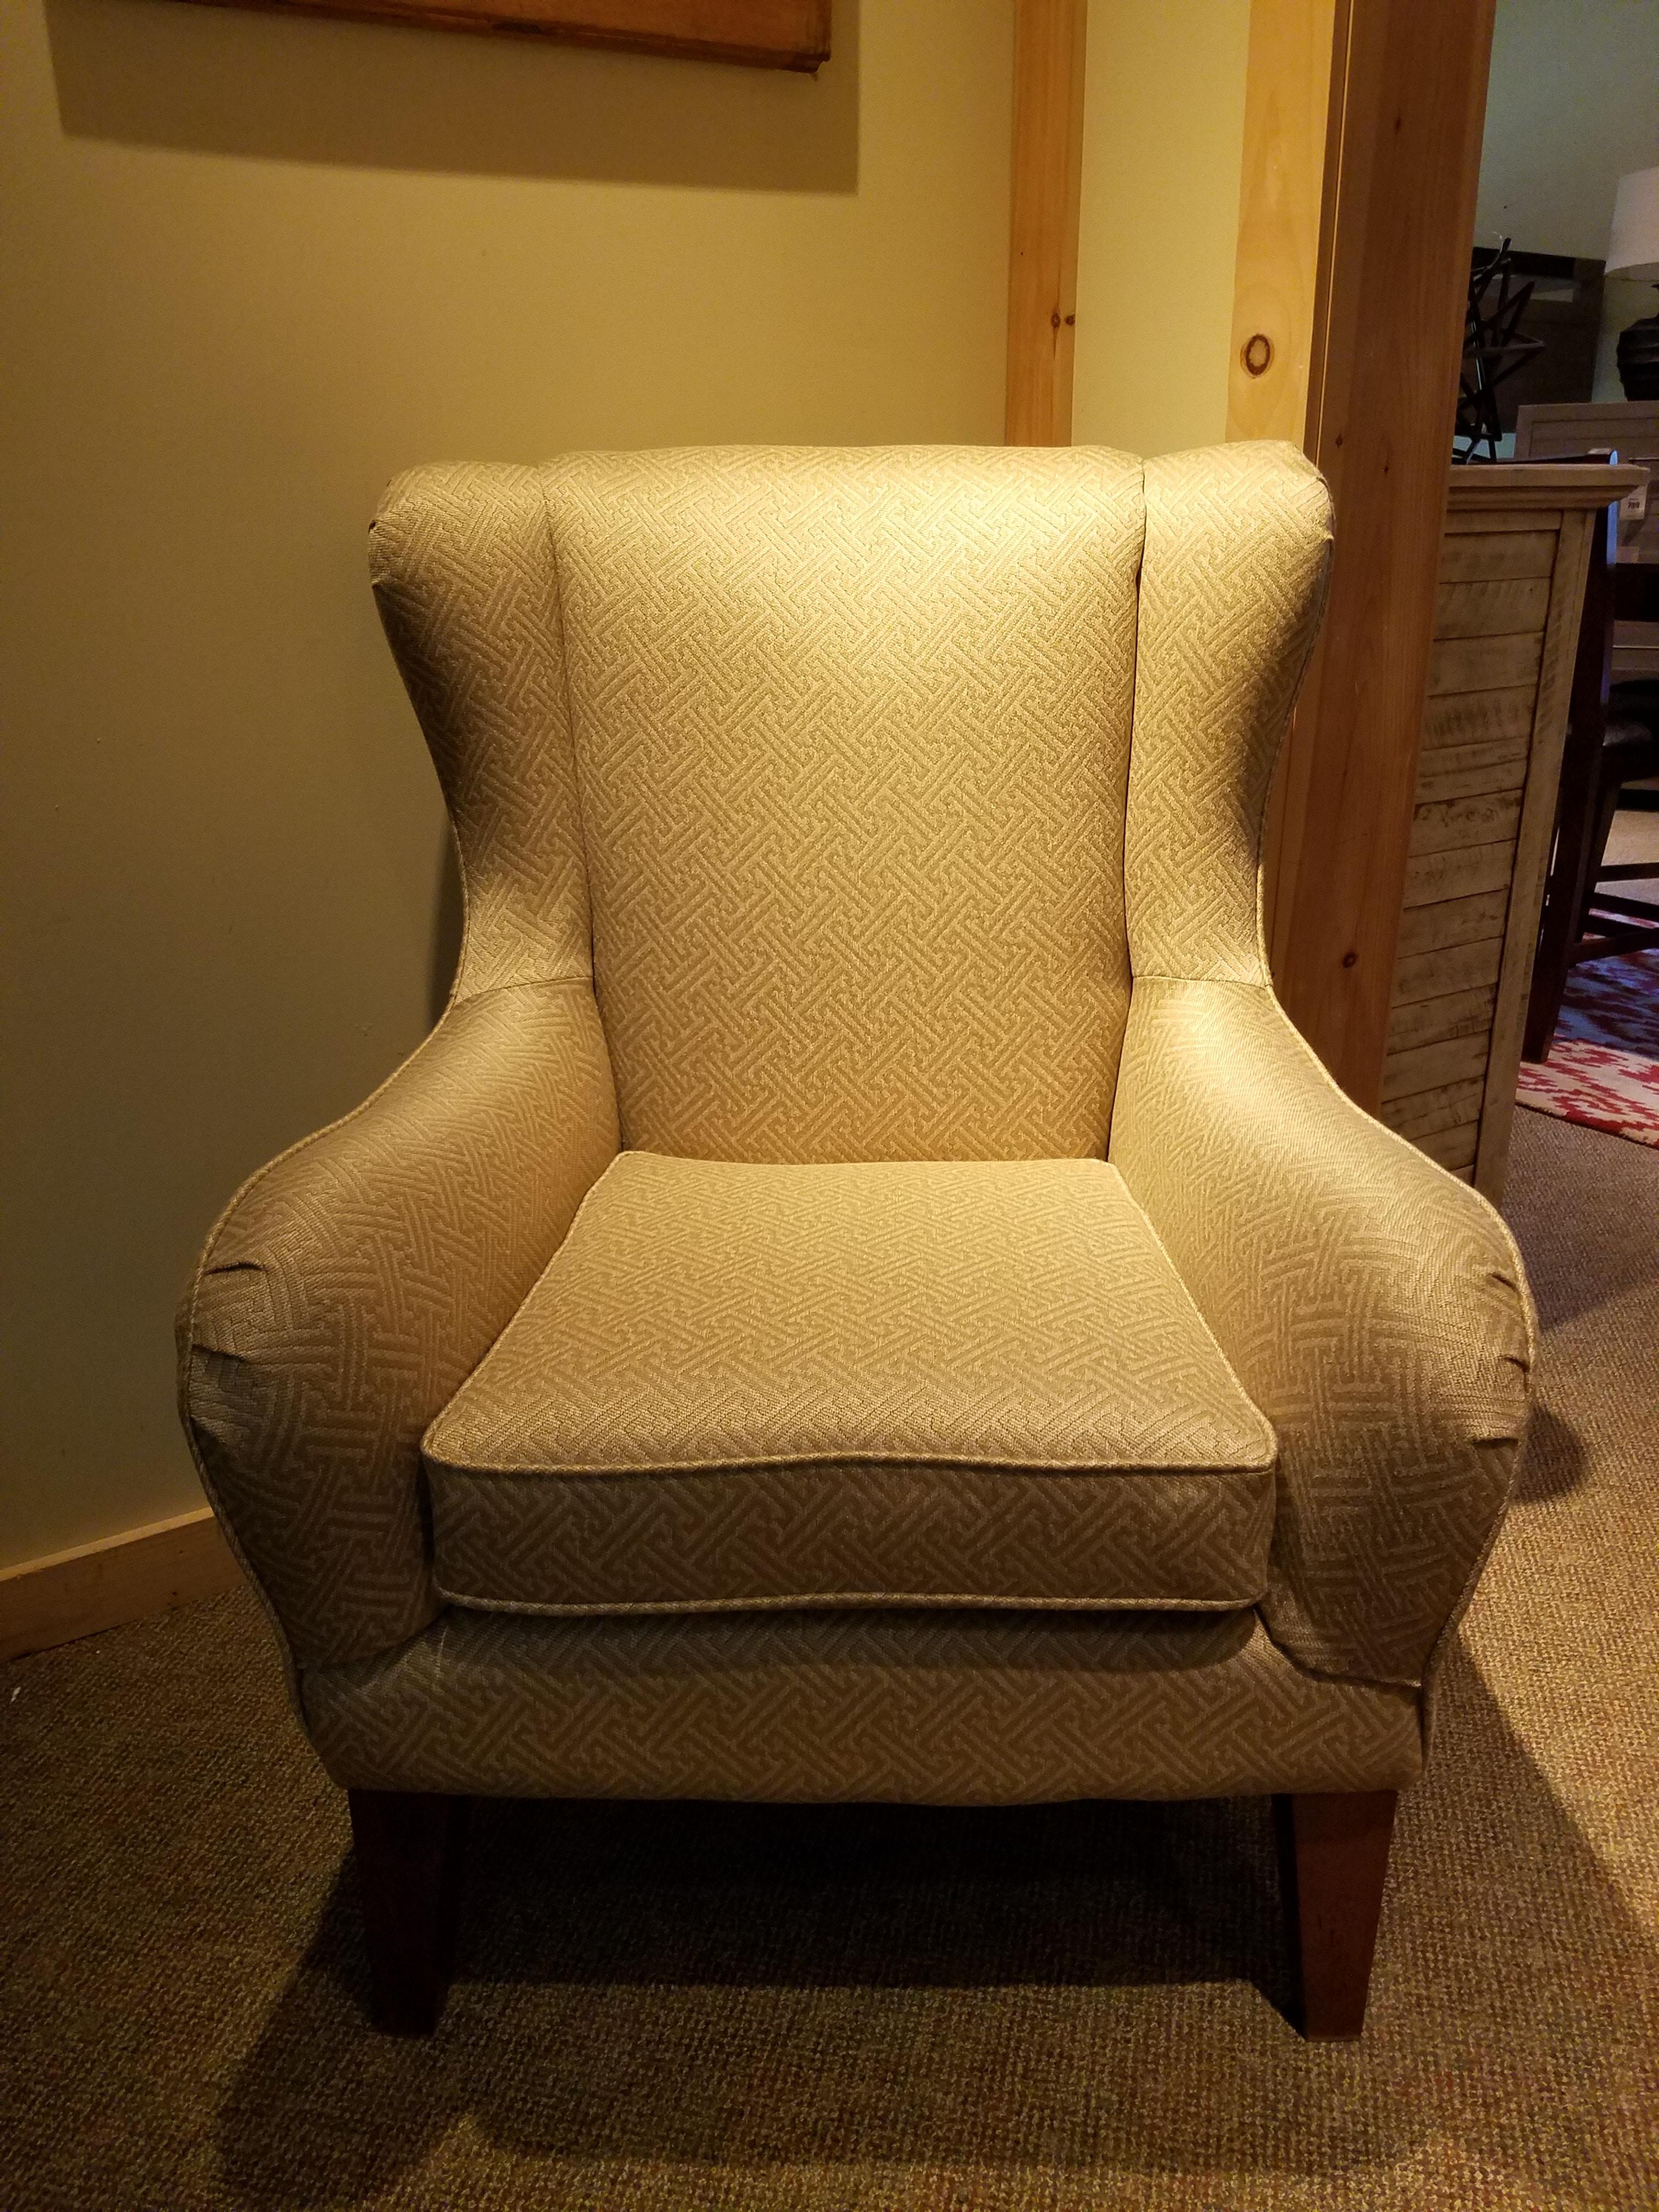 Merveilleux Clearance Chair